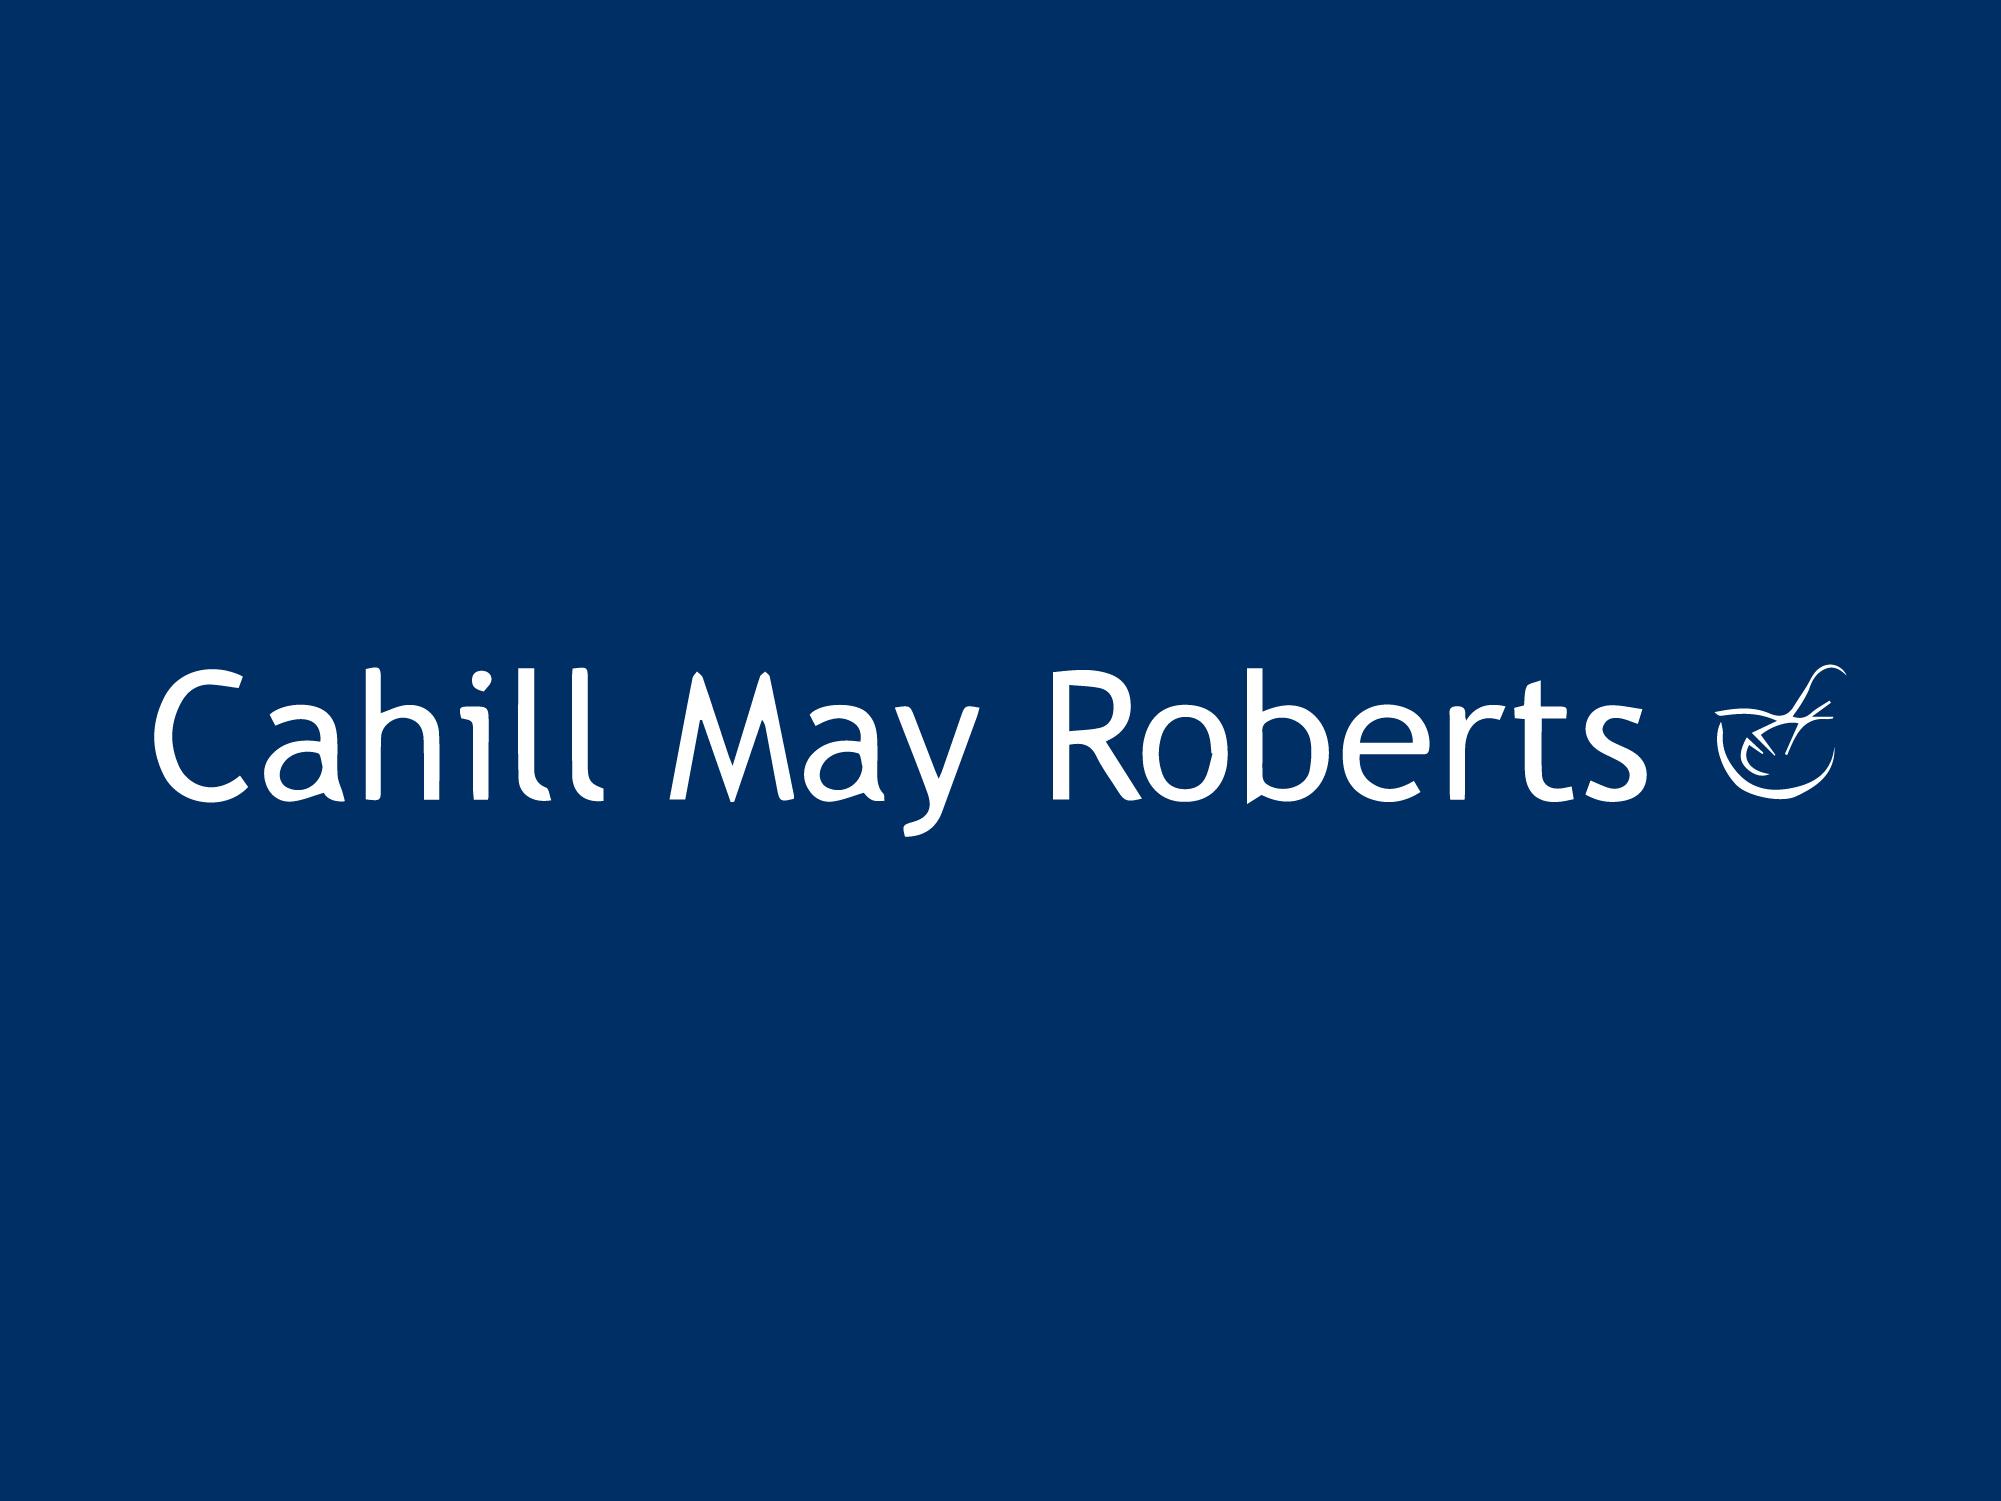 Cahill May Roberts - Acquisition & financing of Cahill May Roberts